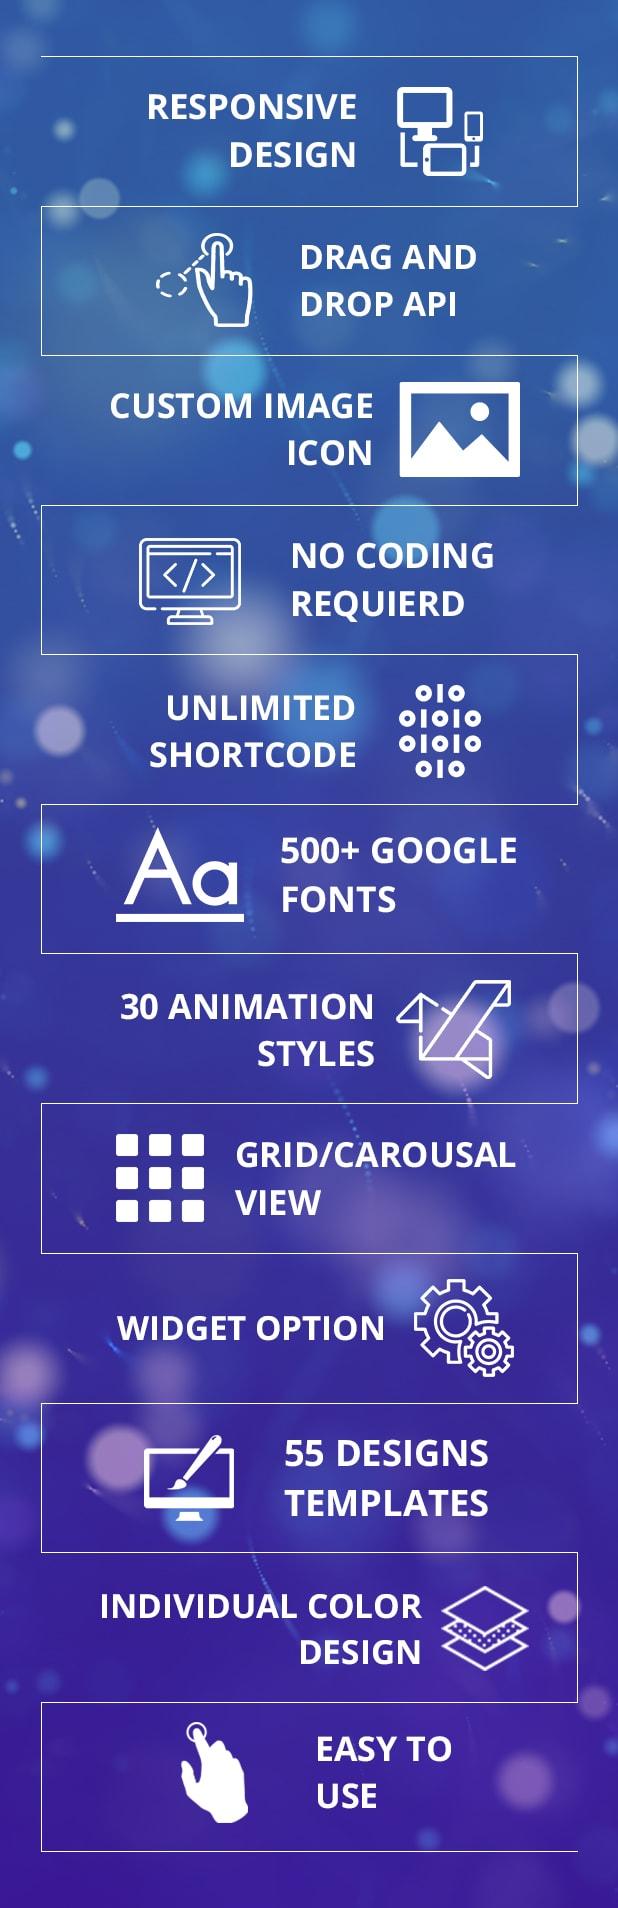 Services Showcase WordPress Plugin Detail